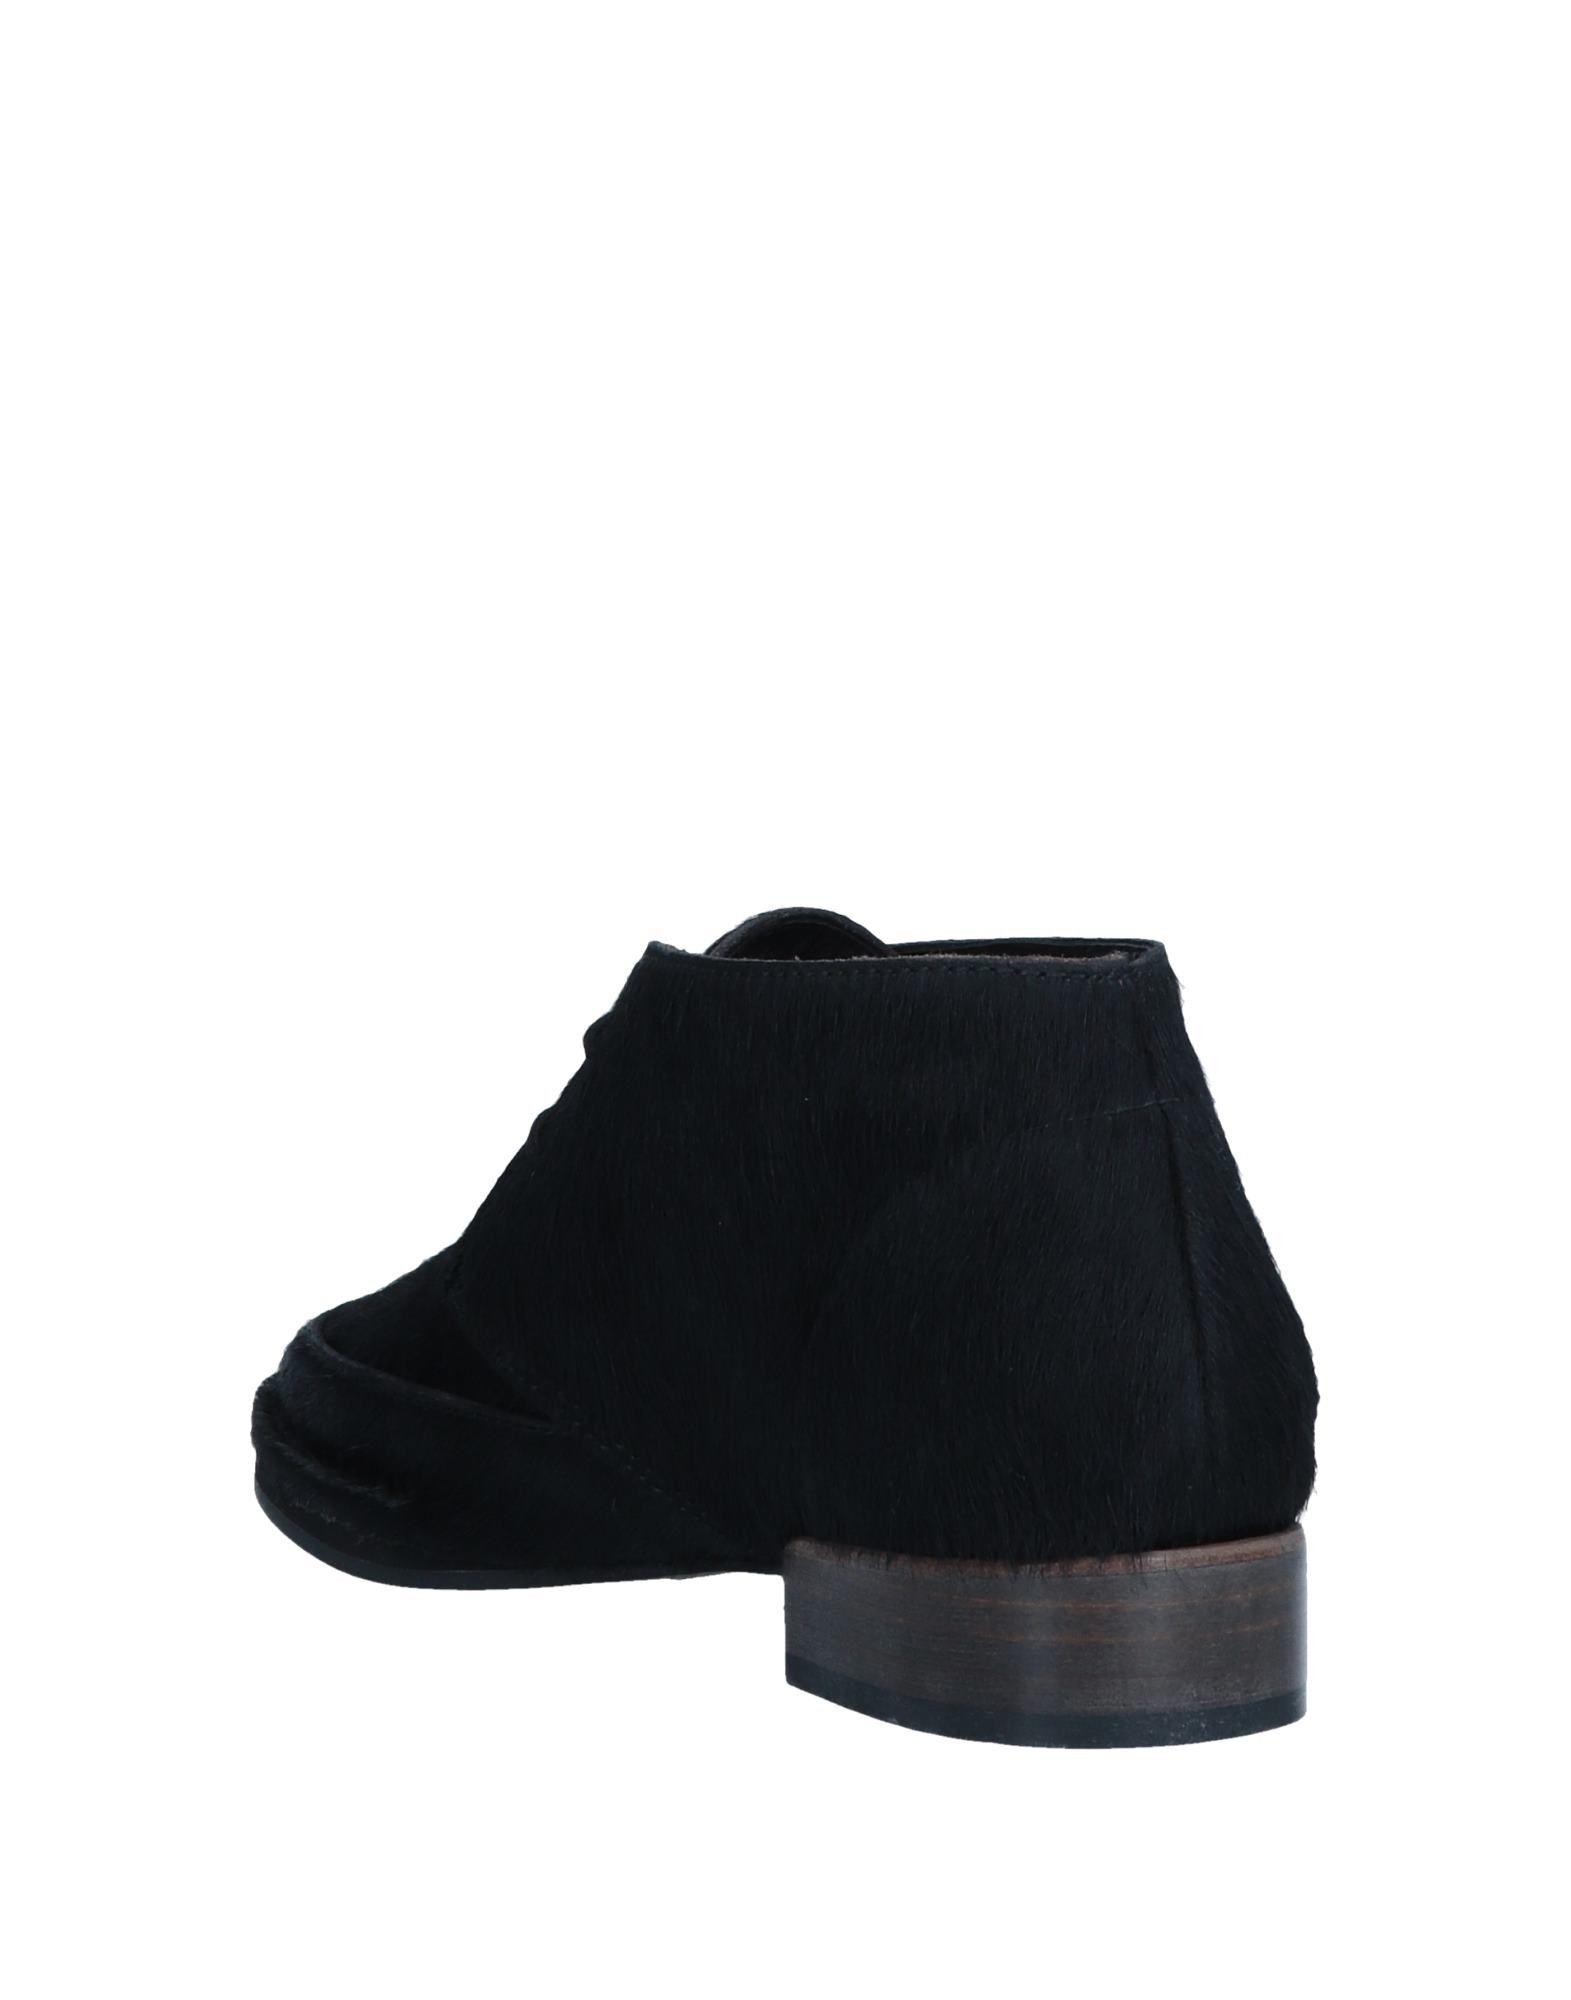 Gut um billige Schuhe Damen zu tragenAnaid Kupuri Stiefelette Damen Schuhe  11552619NA 0059f3